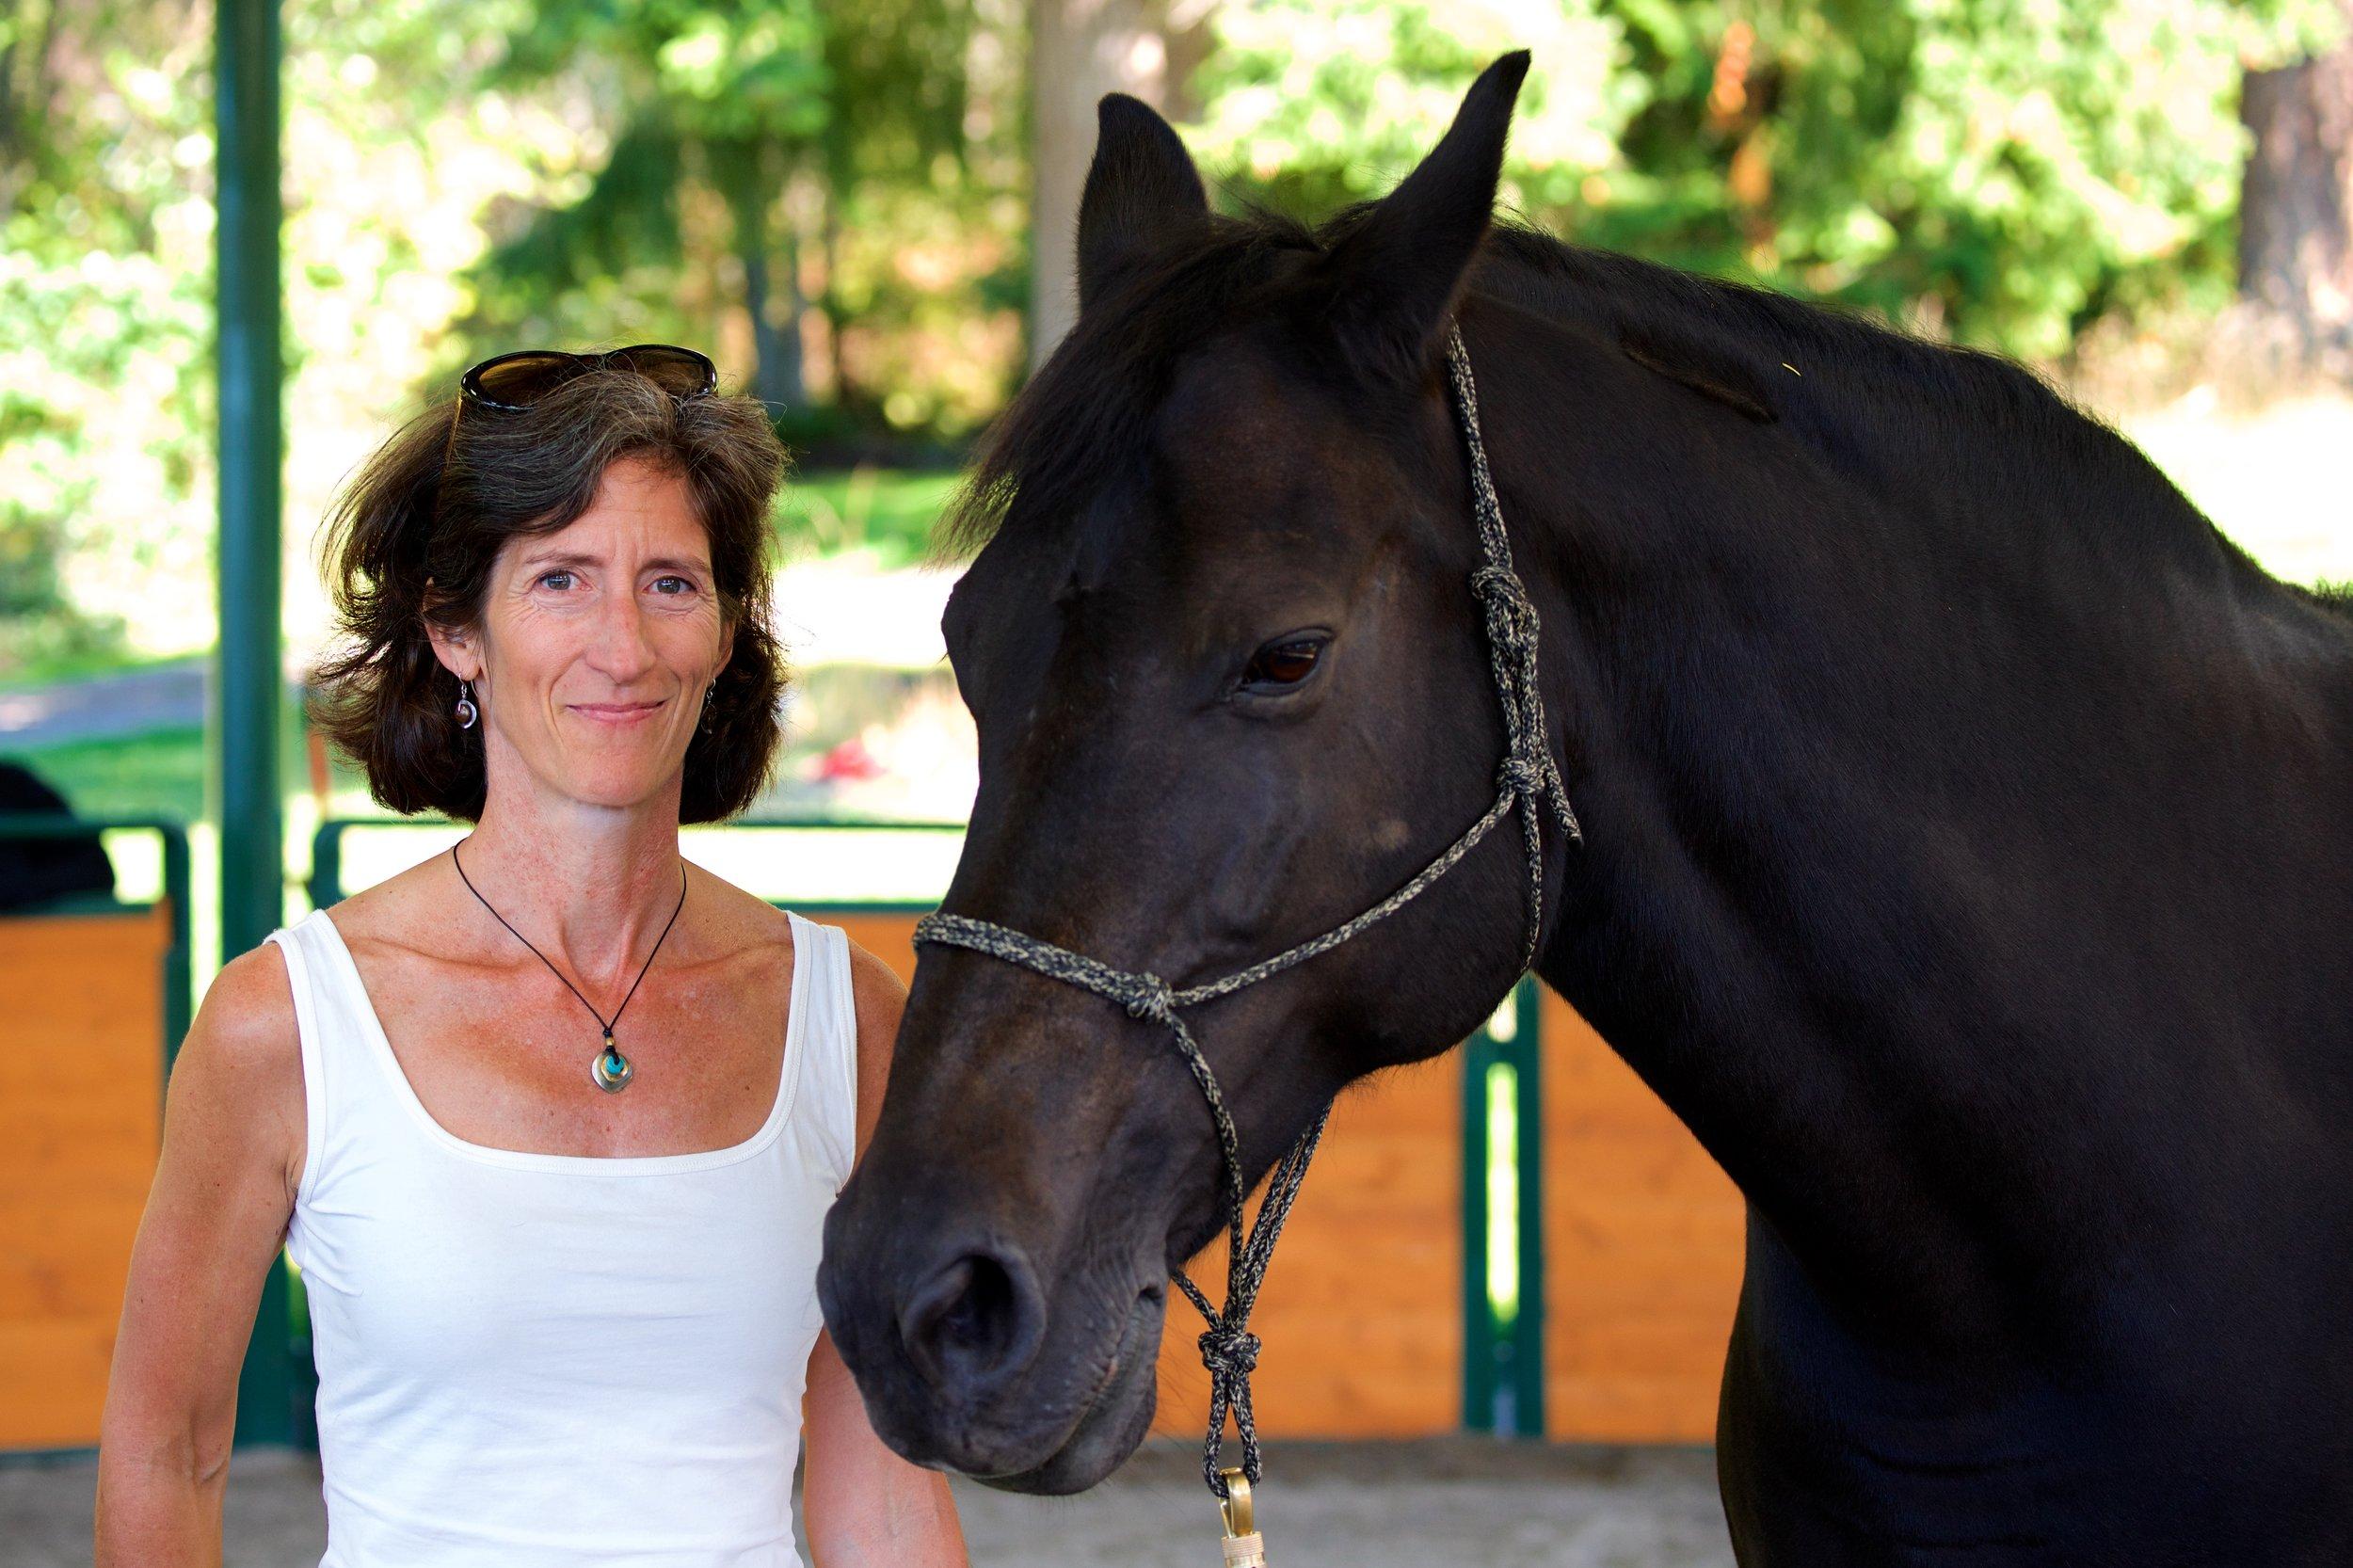 Virginia Rhoads on Equine Coaching, coaching with horses